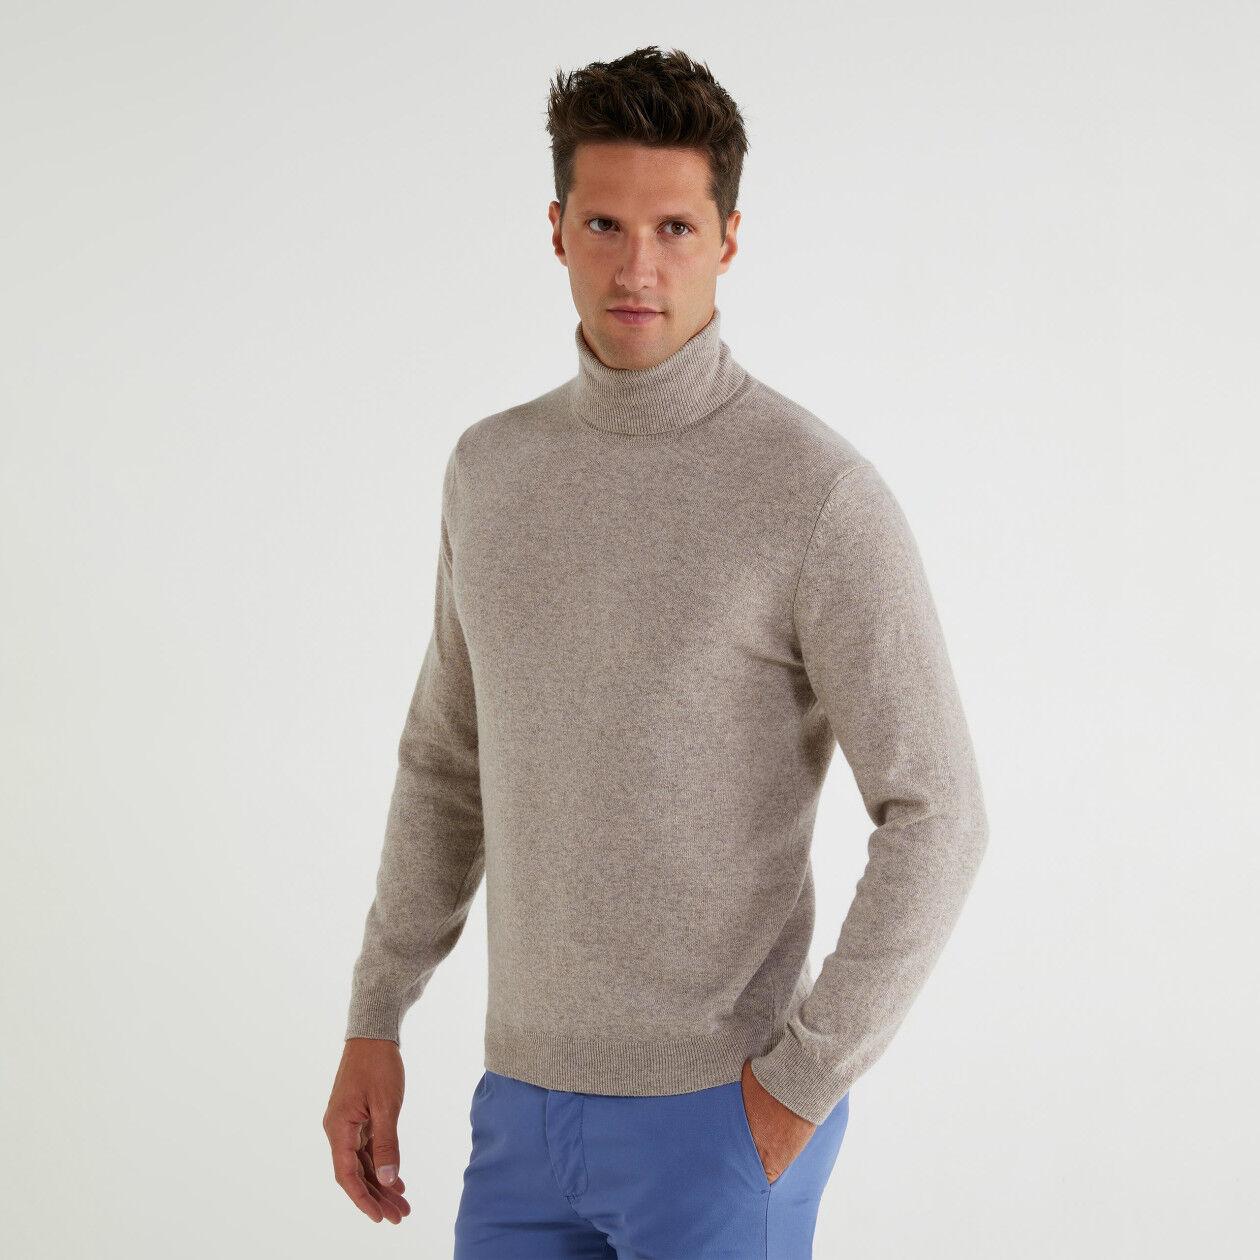 Camisola de gola alta 100% lã virgem